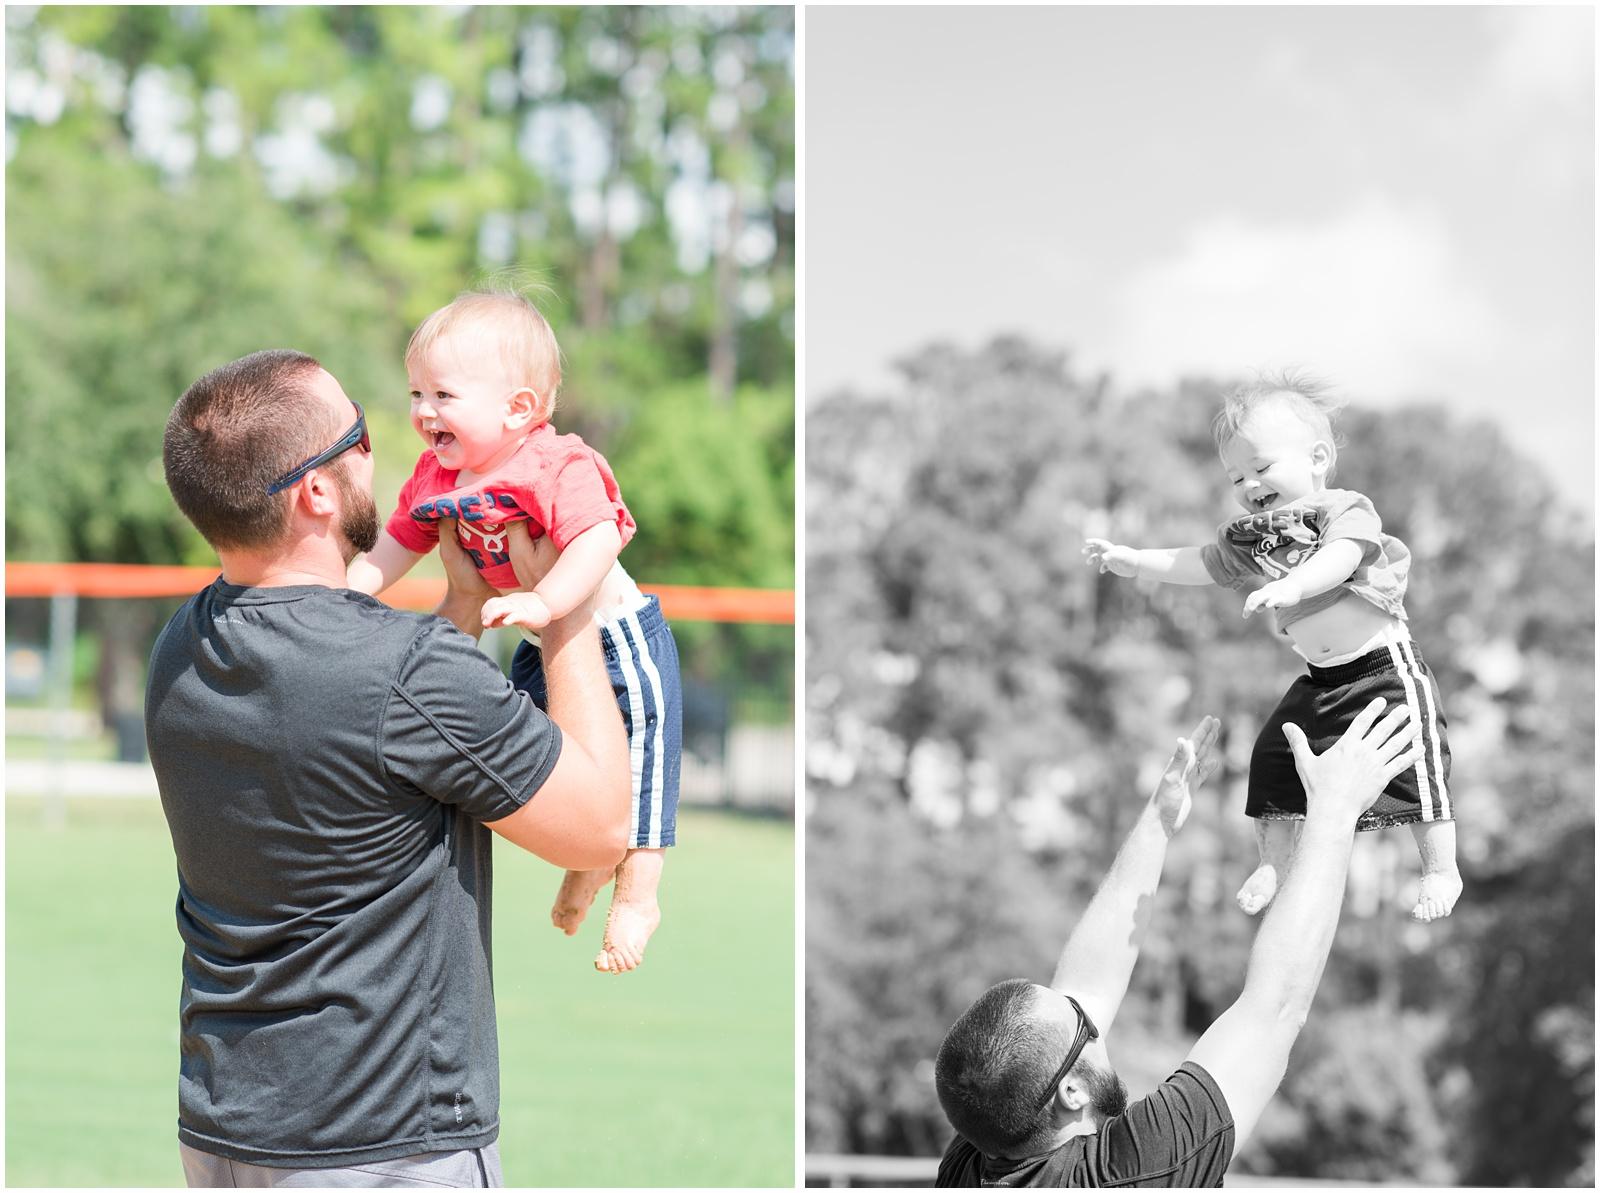 One Year_Baby_Portraits_Baseball_Field_23.jpg